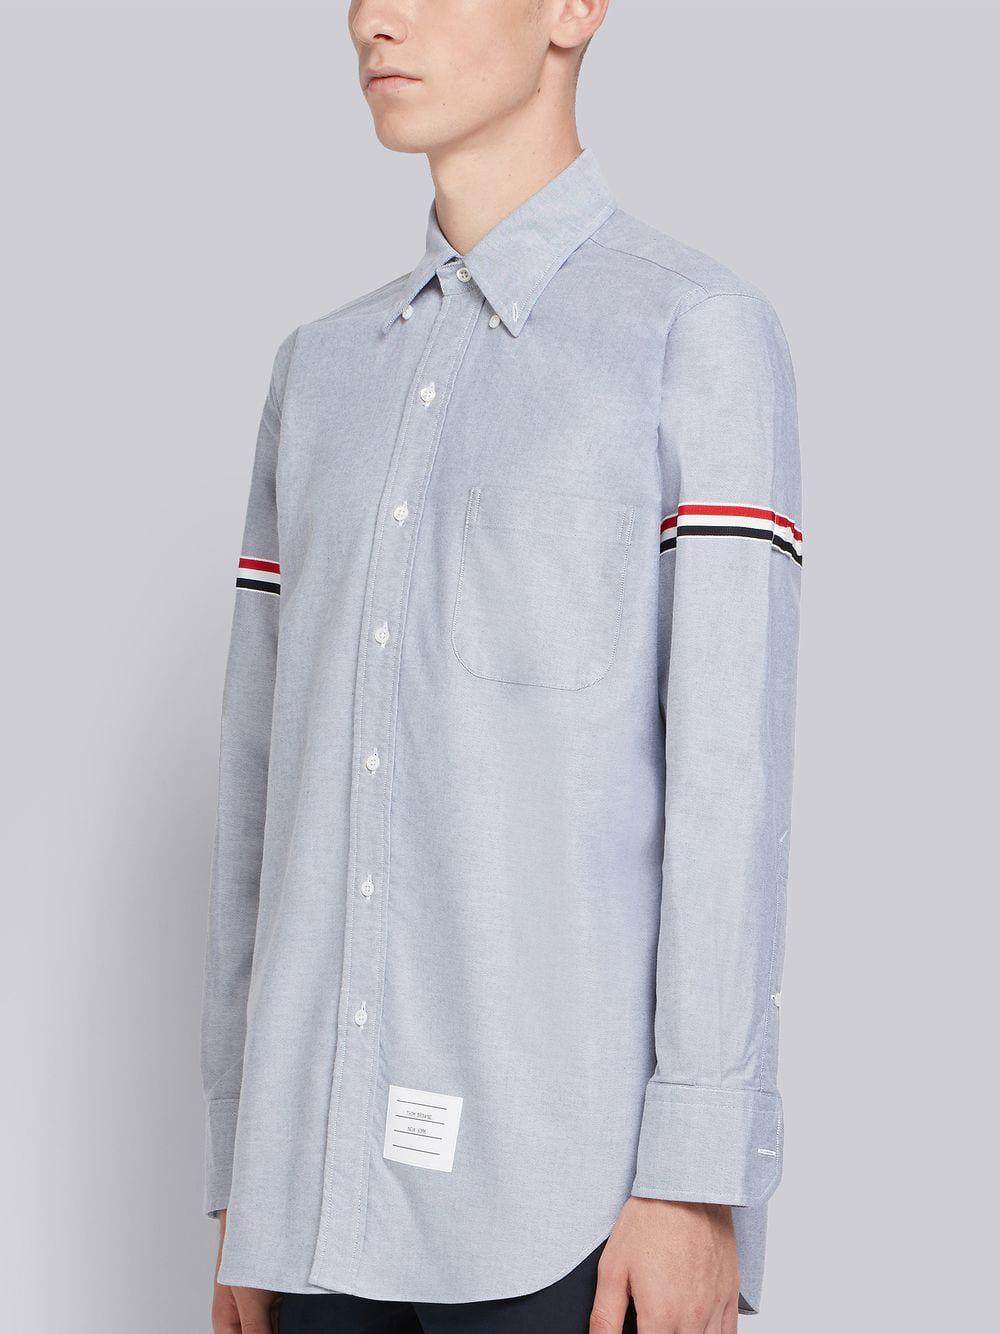 b432b5476a0 Lyst - Thom Browne Grosgrain Armband Oxford Shirt in Blue for Men